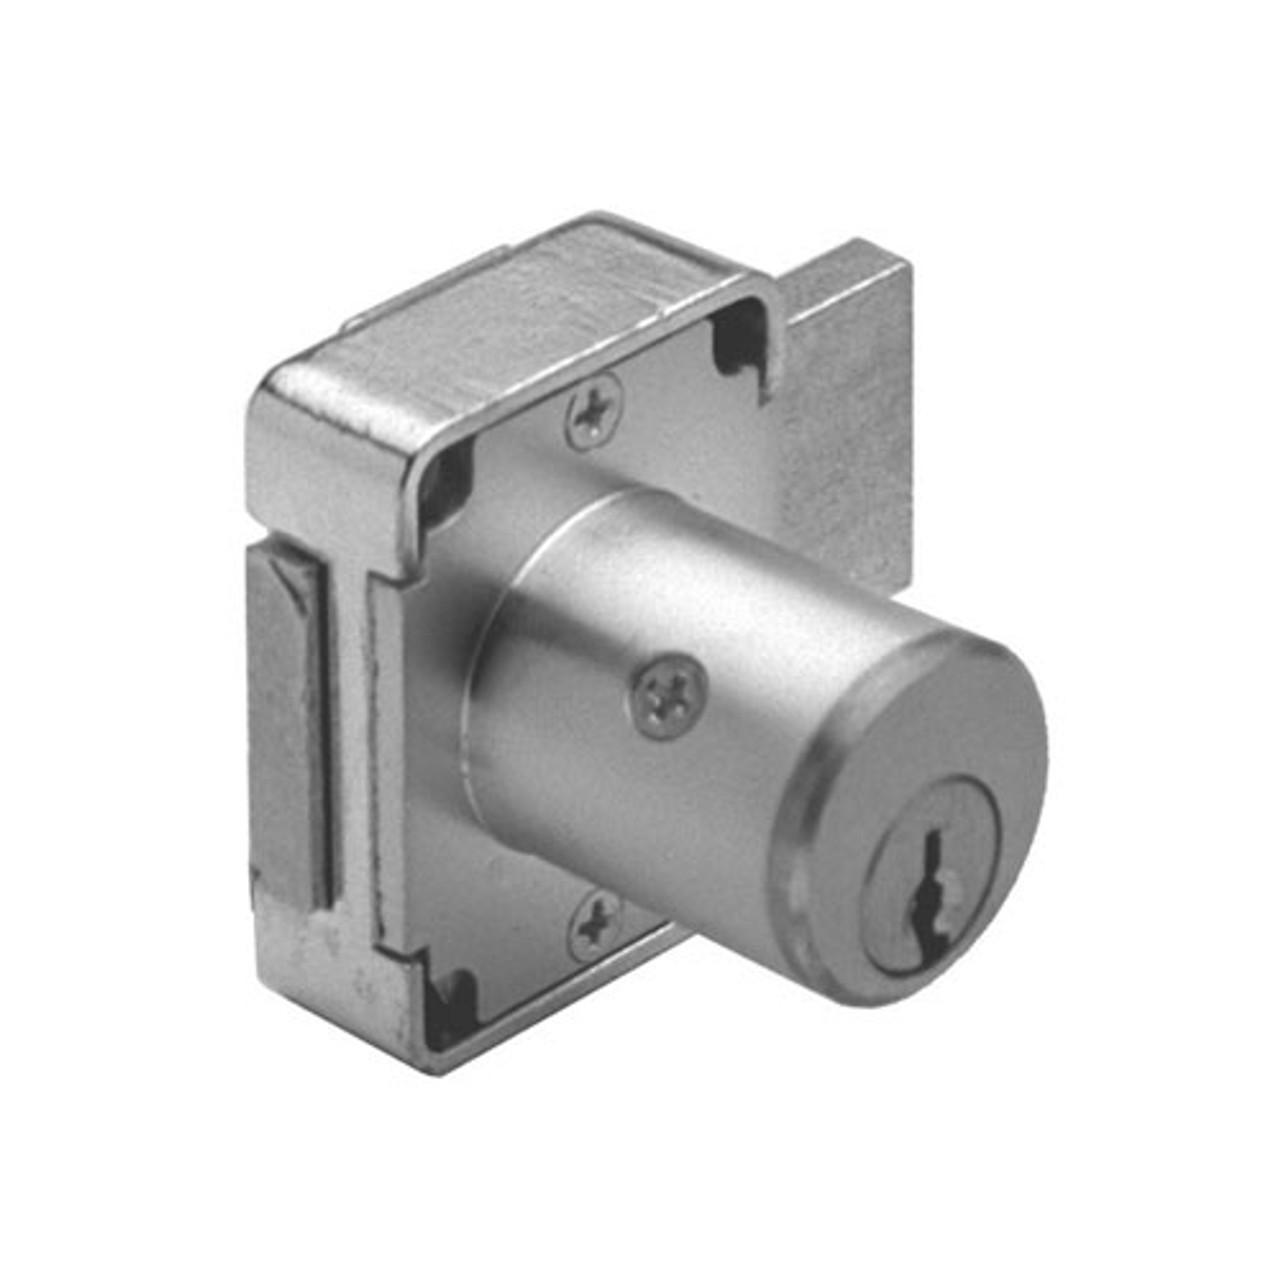 Olympus 100DR-KA101-26D-1-3/8 Deadbolt Locks in Satin Chrome Finish